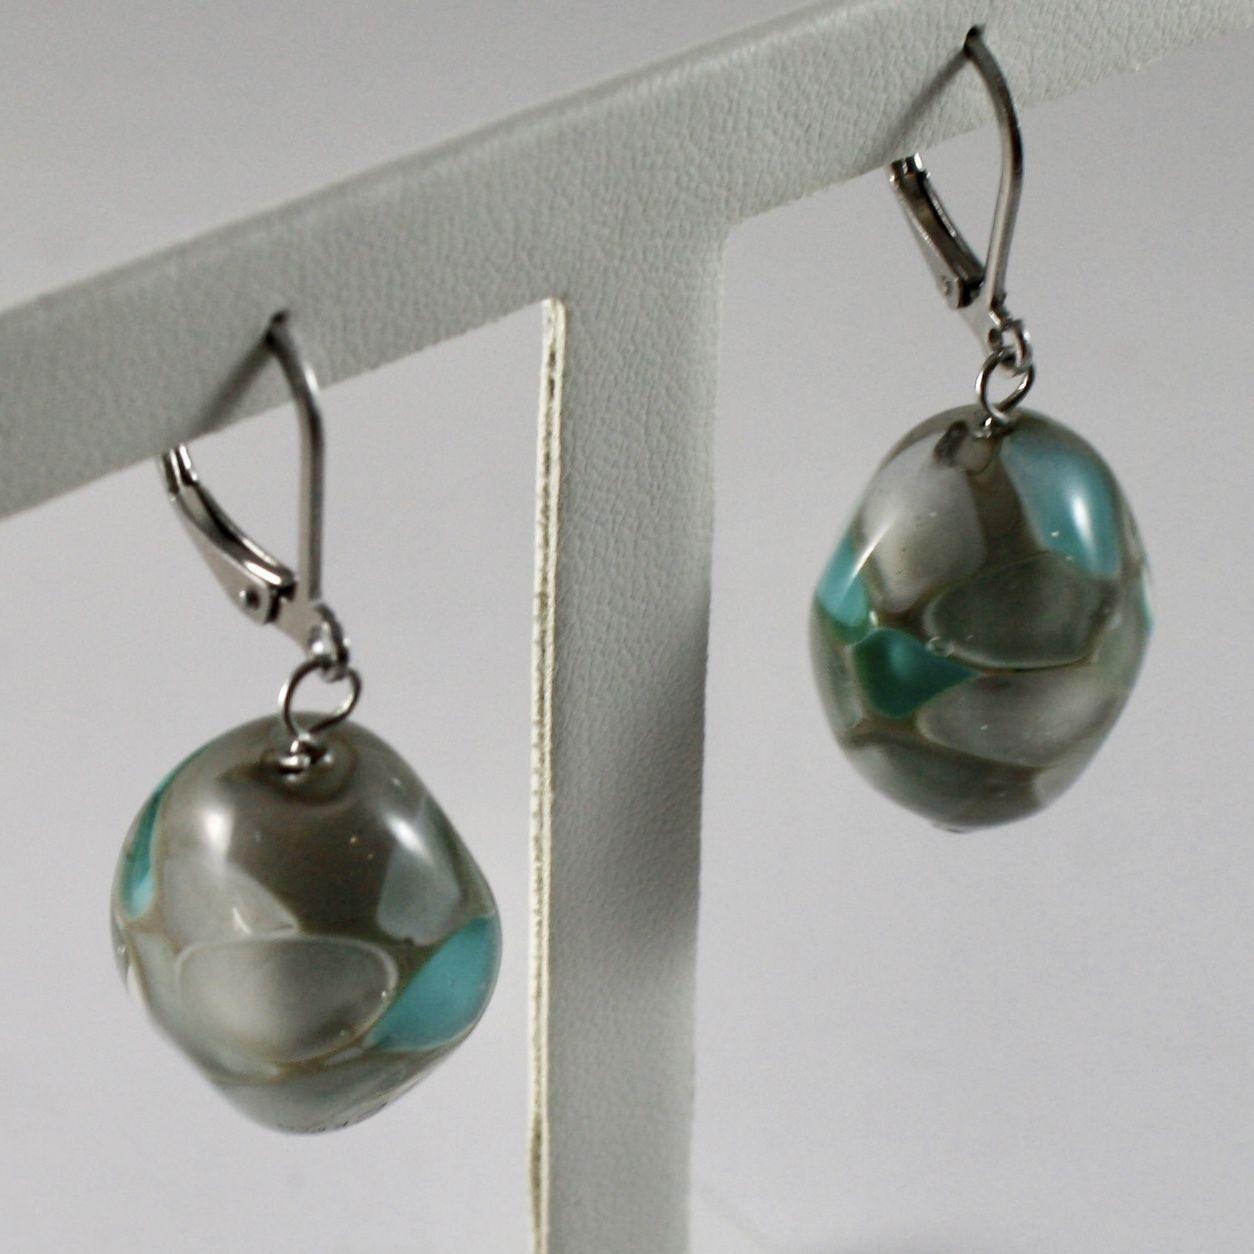 ANTICA MURRINA VENEZIA COLLECTION EARRINGS WITH MURANO GLASS BEADS, GREEN GRAY